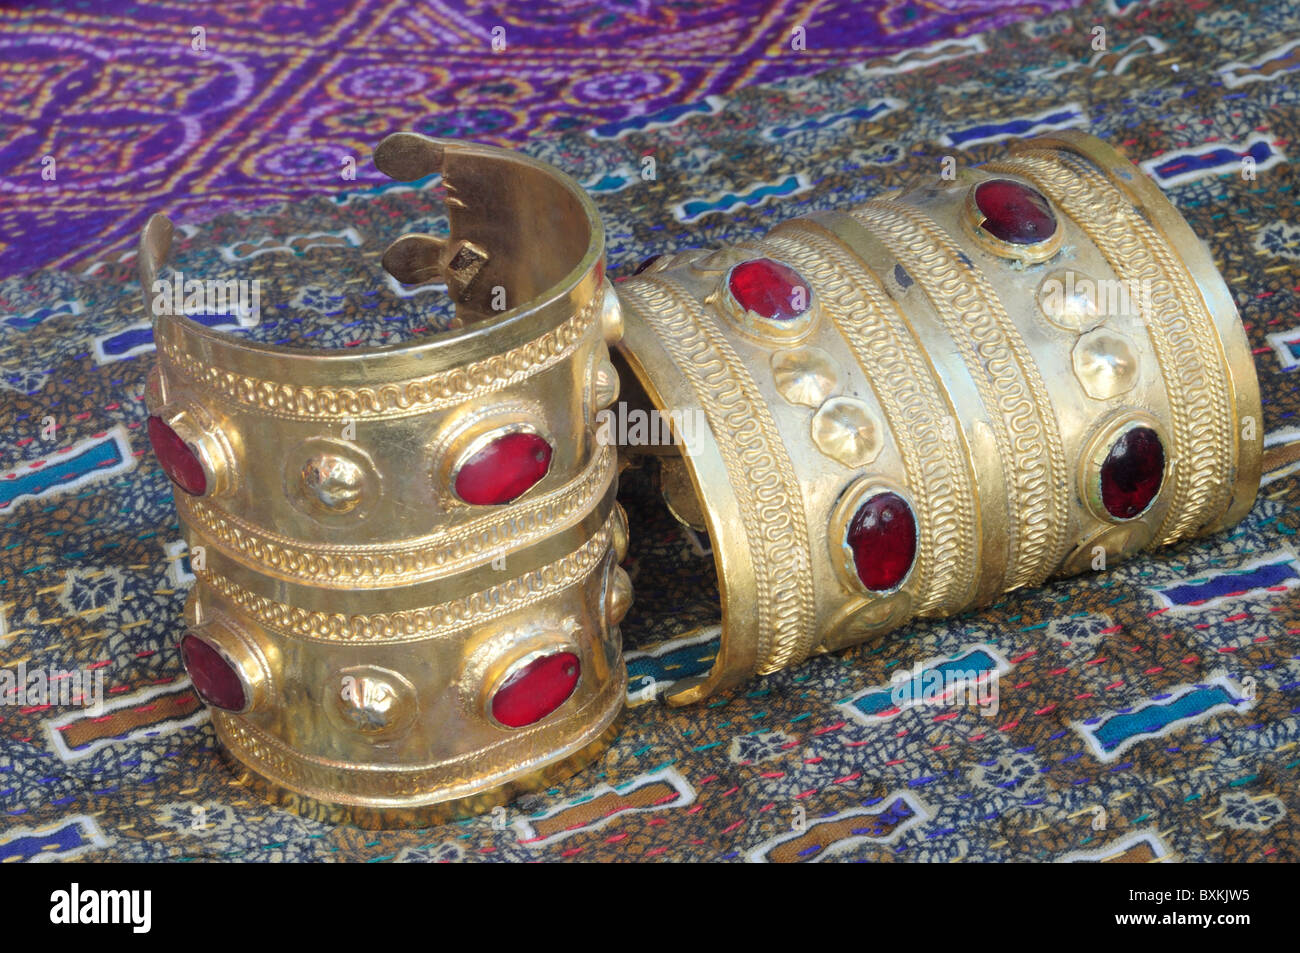 Bracelects for sale in Michelle Baconnier shop Rue de Vieux, in the Gueliz area of Marrakech - Stock Image